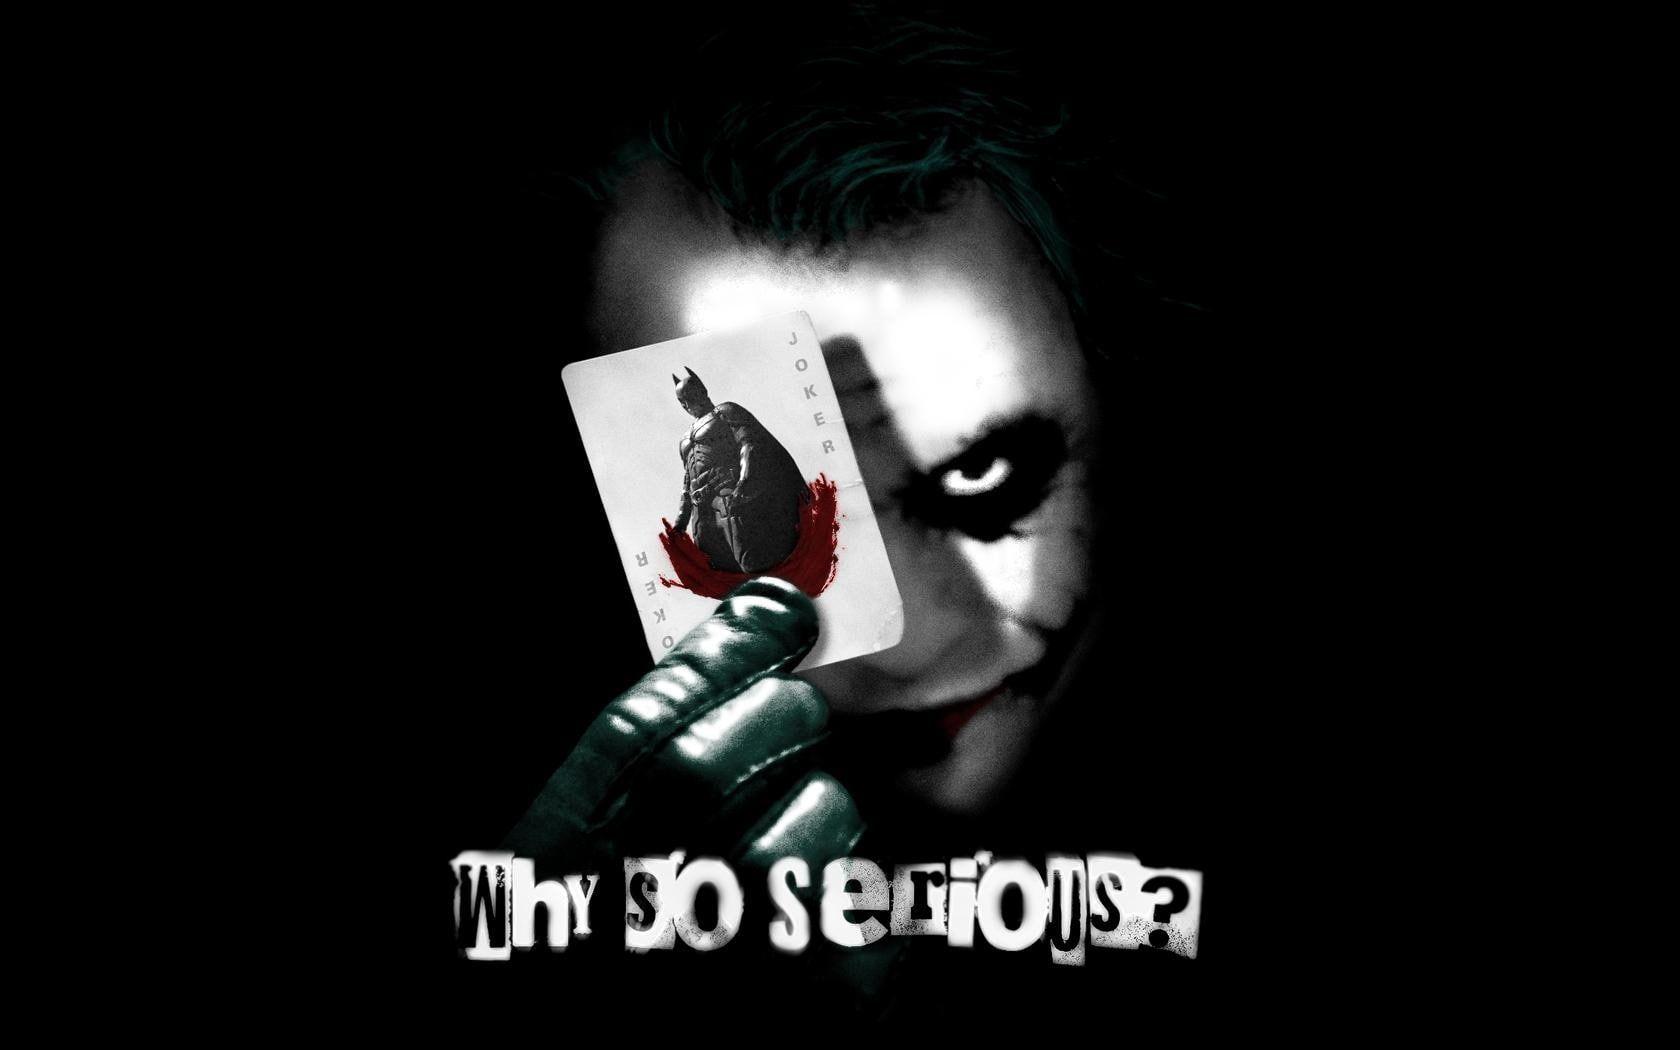 Why So Serious Joker Batman Card Heath Ledger Movies 720p Wallpaper Hdwallpaper Deskto In 2021 Joker Wallpapers Heath Ledger Joker Wallpaper Heath Ledger Joker